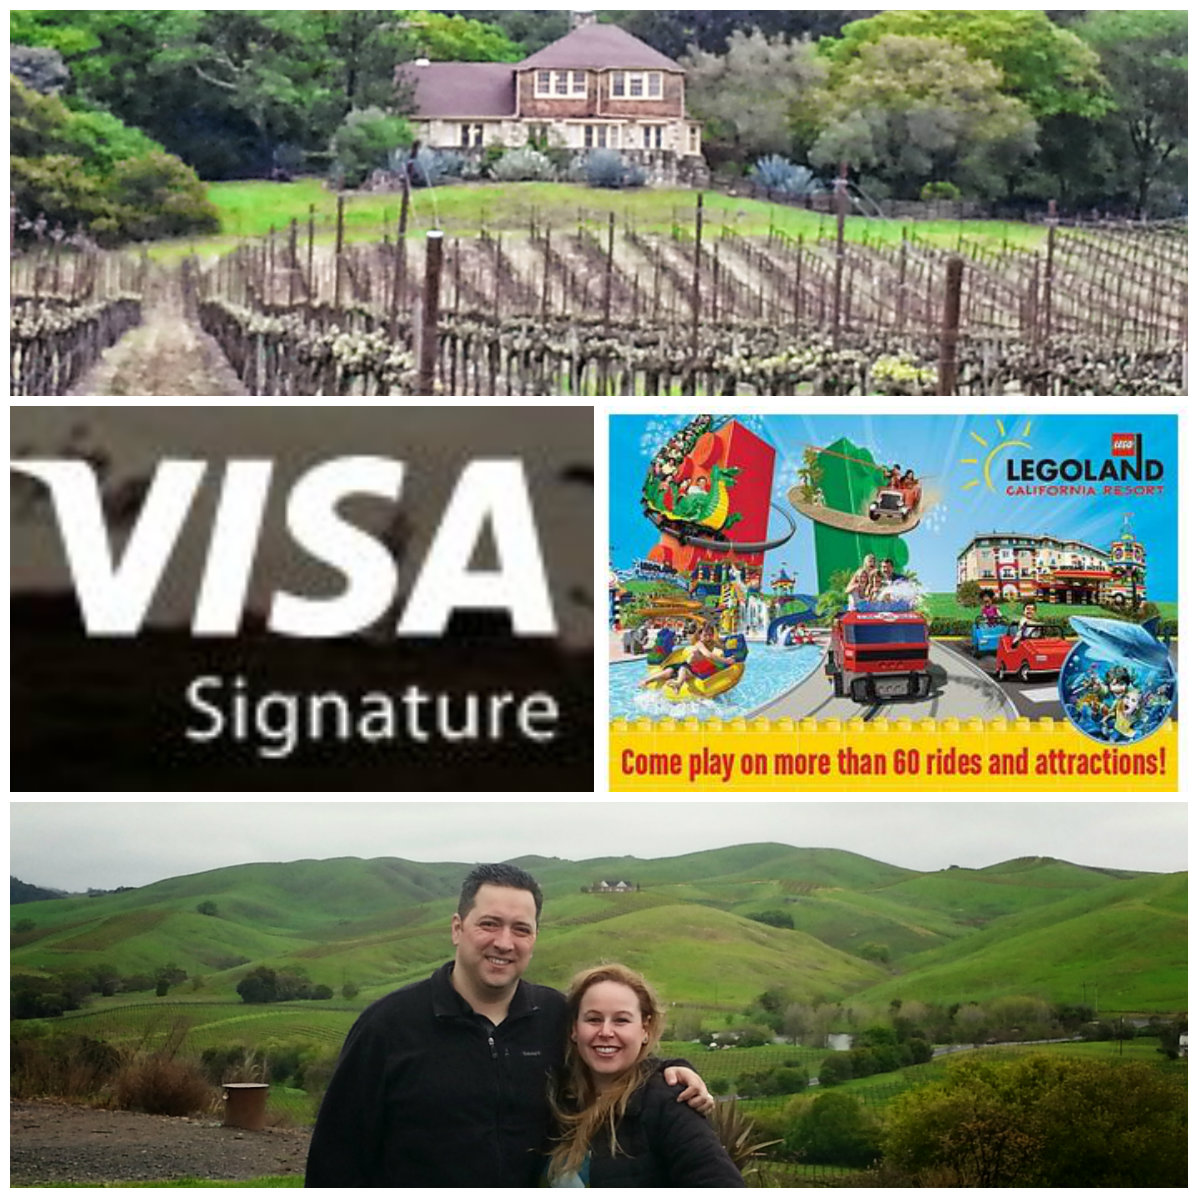 visa signature card, credit card benefits, visa signature benefits